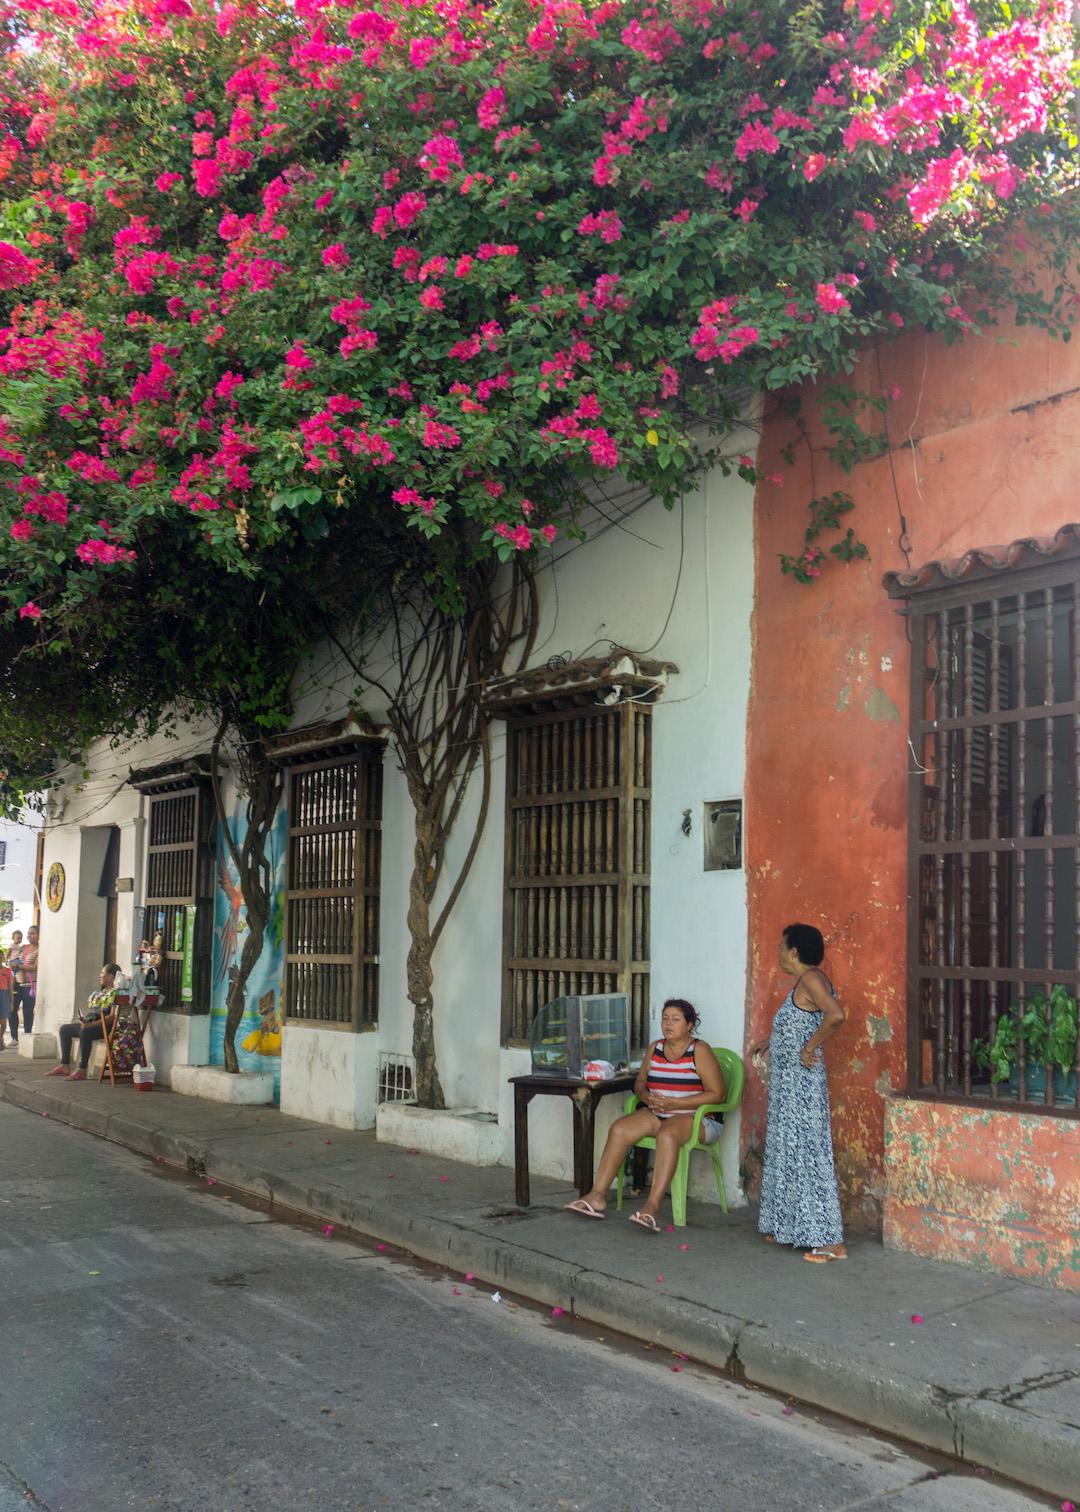 Street in Getsemani, Cartagena